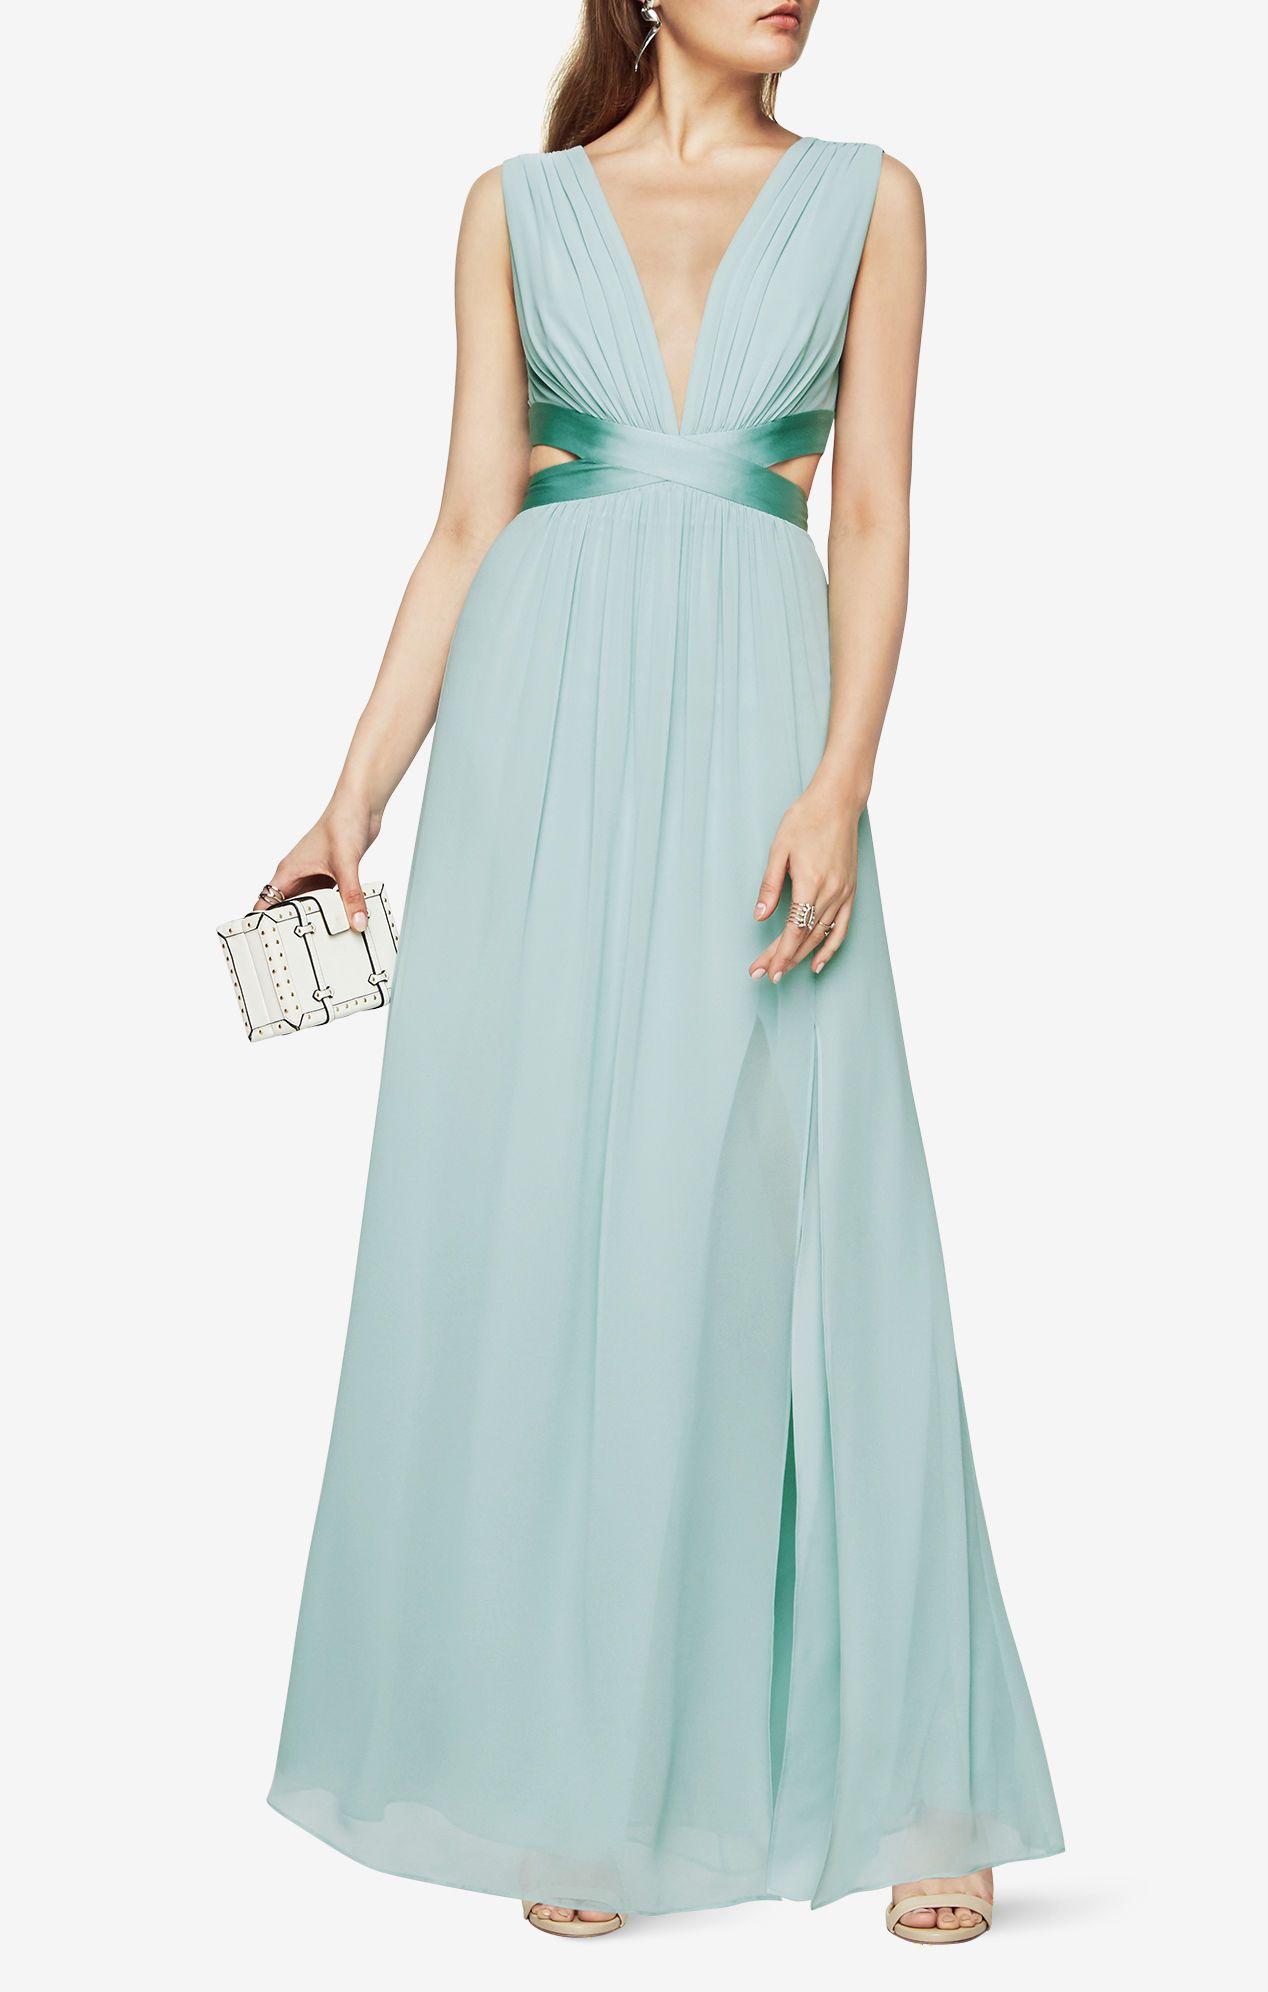 Julianne Cutout Gown   Fashion   Pinterest   Gowns and Fashion